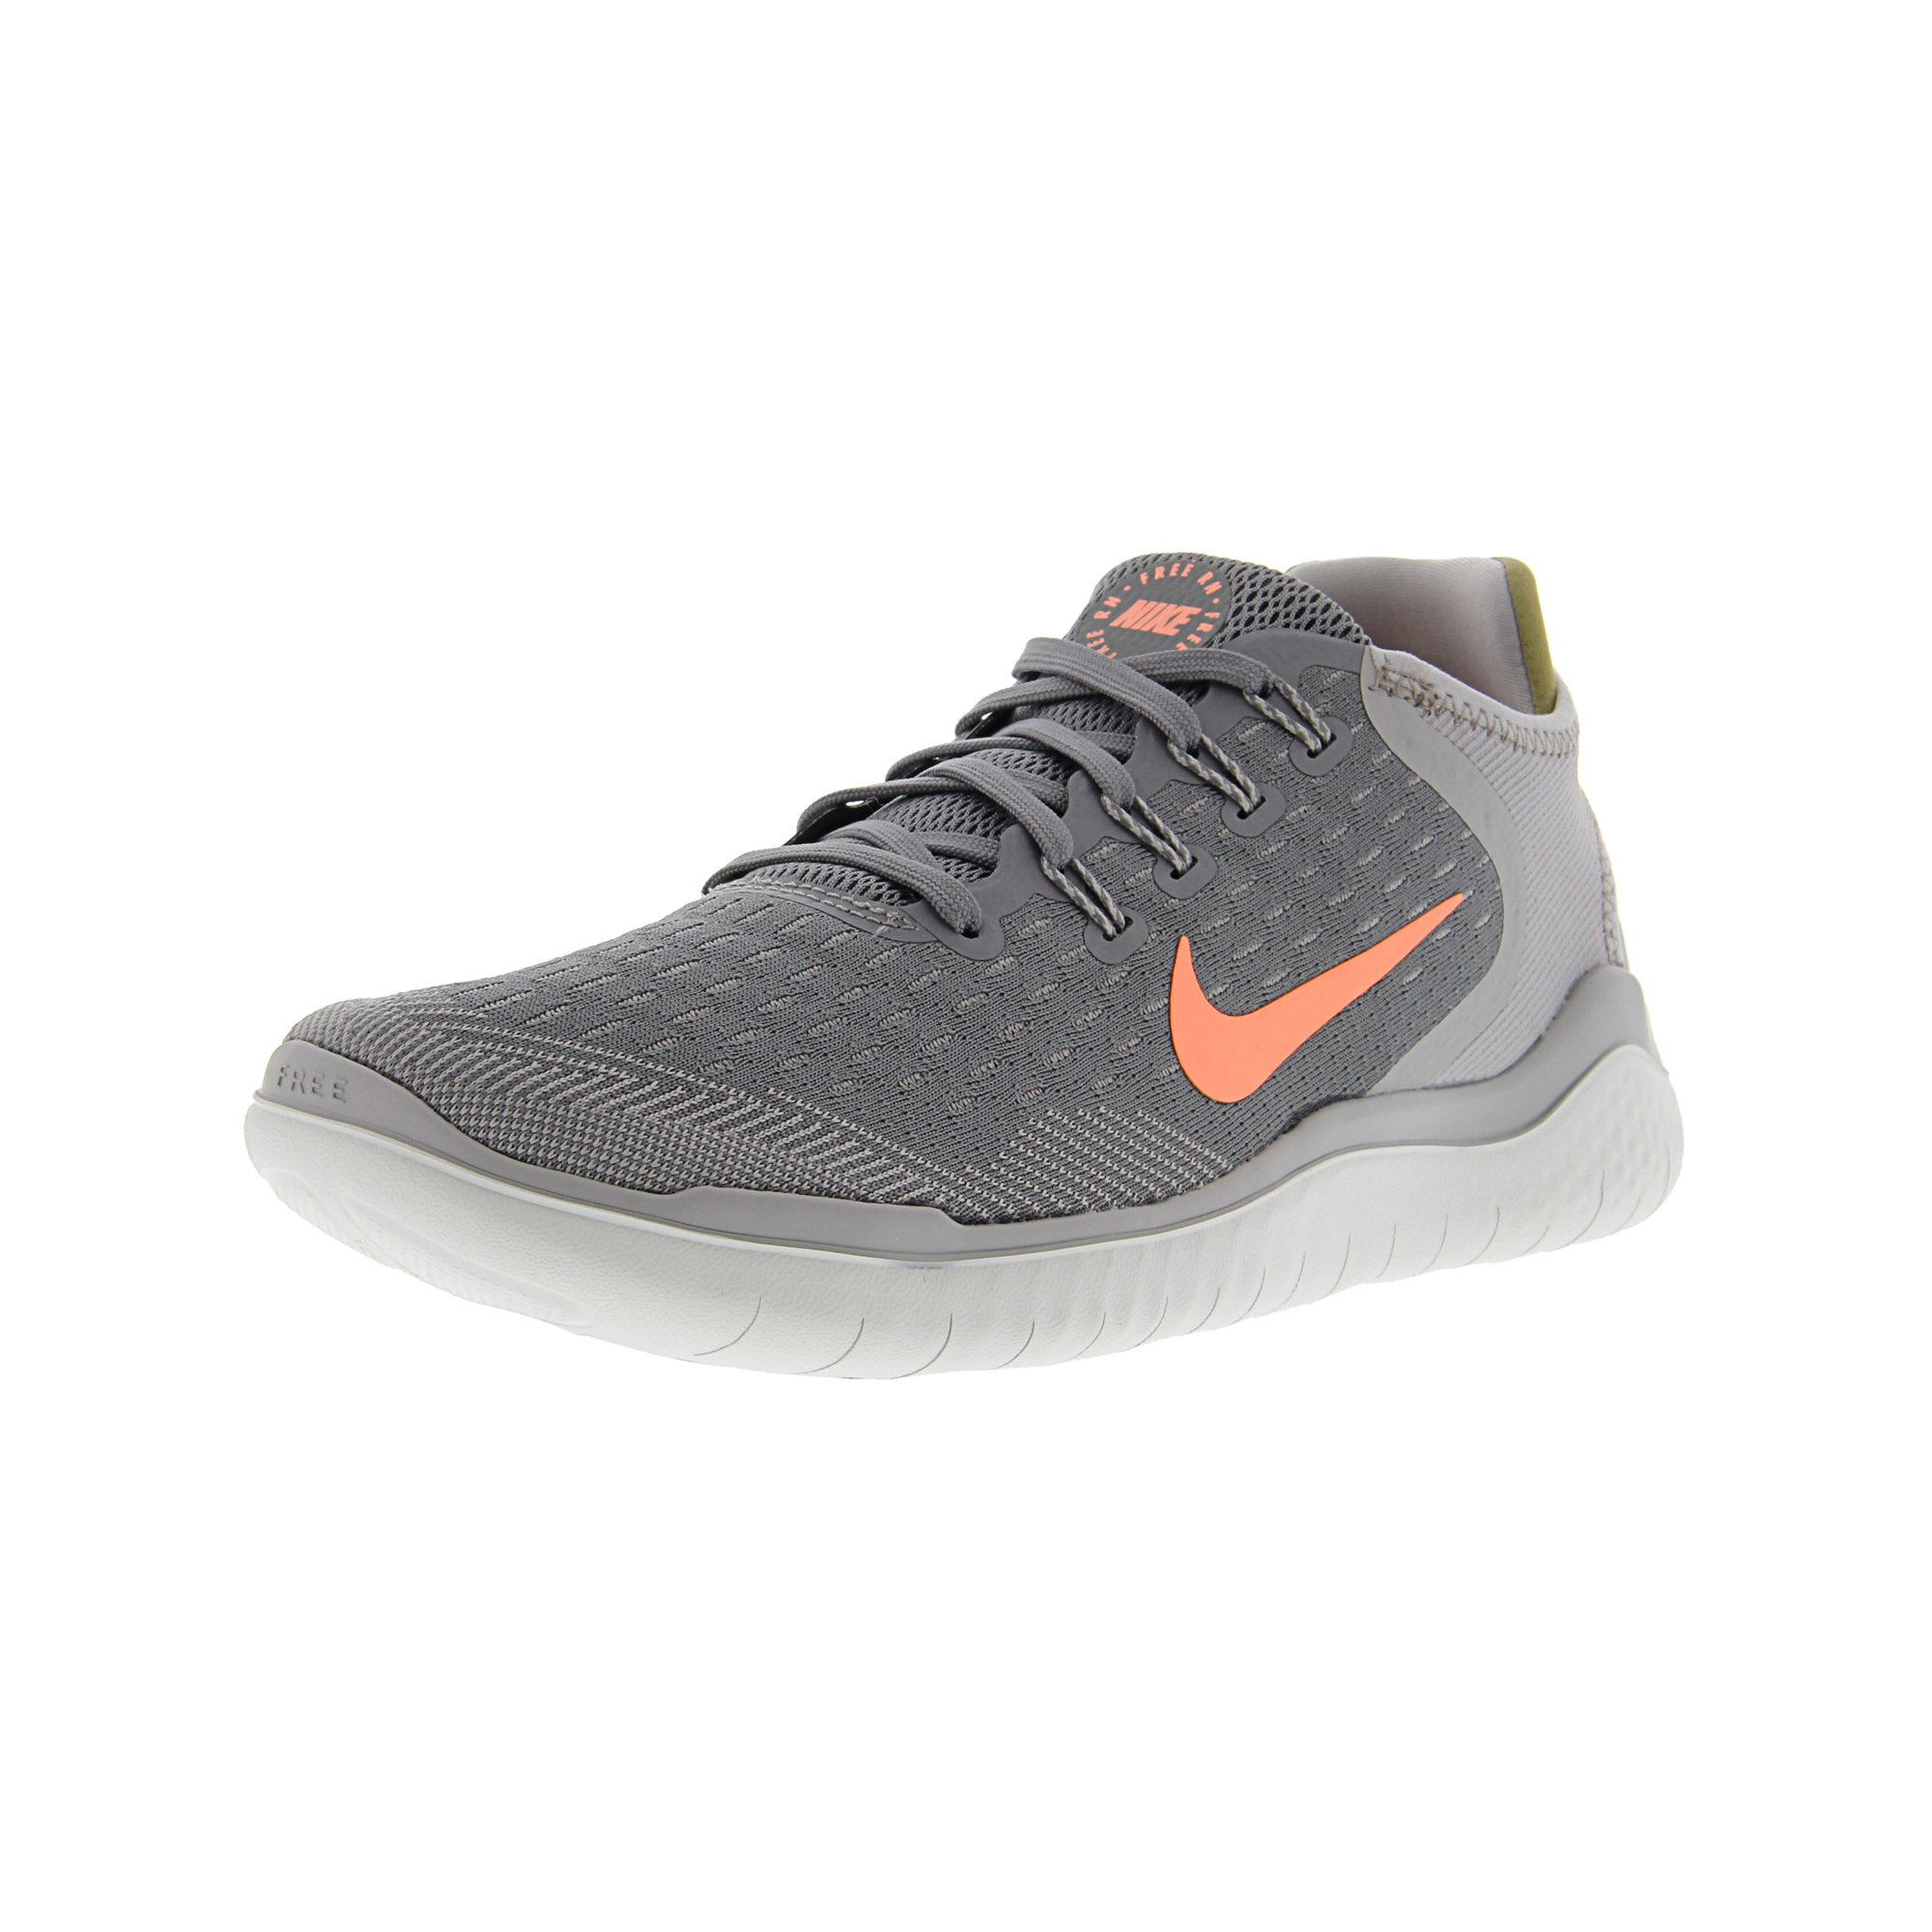 innovative design d0fae a41bf Nike Women's Free Rn 2018 Gunsmoke / Crimson Pulse Ankle-High Running Shoe  - 6.5M